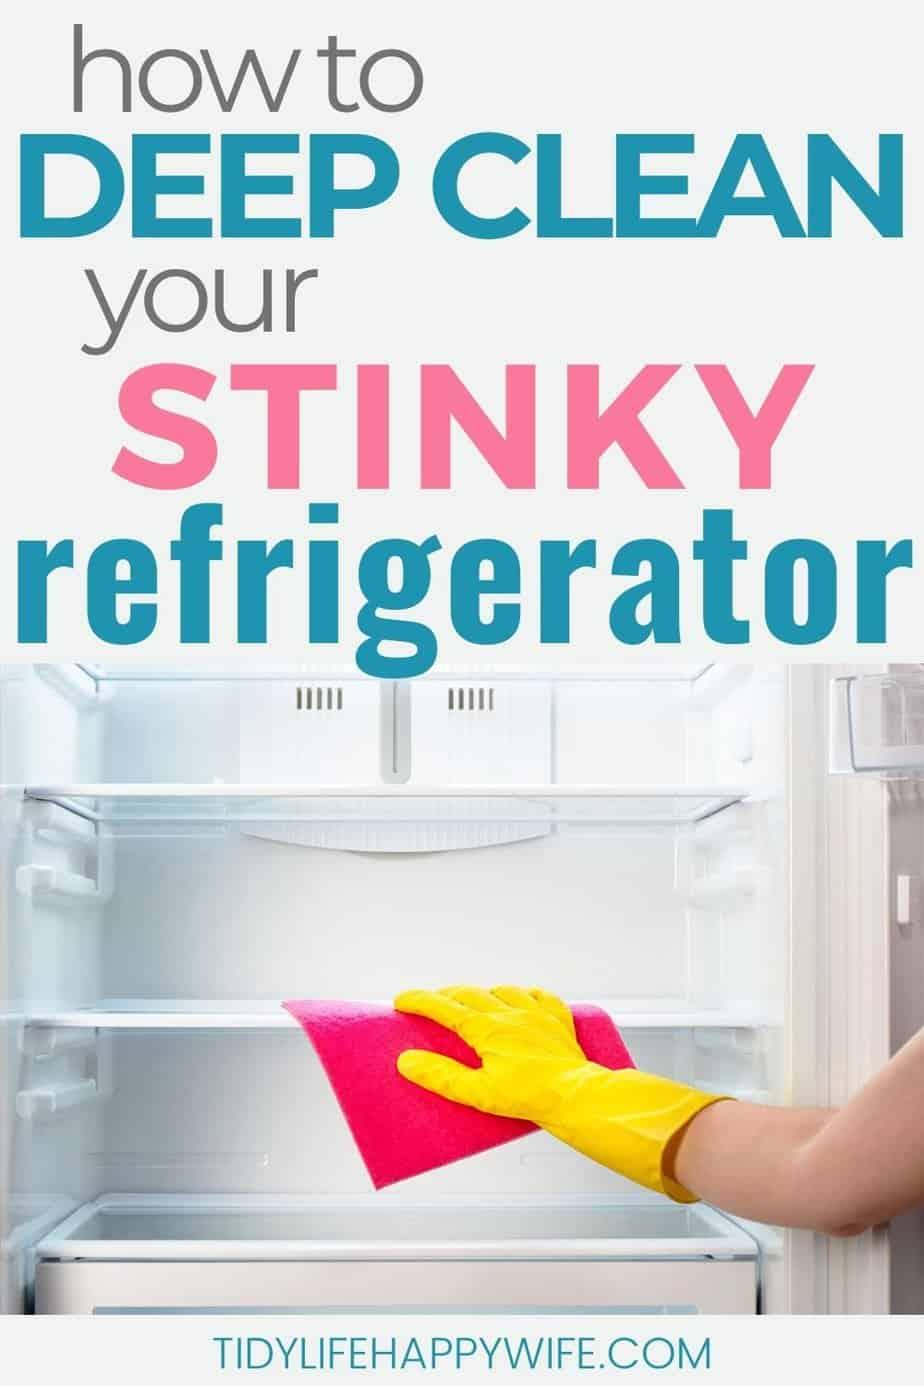 deep cleaning fridge with microfiber cloth